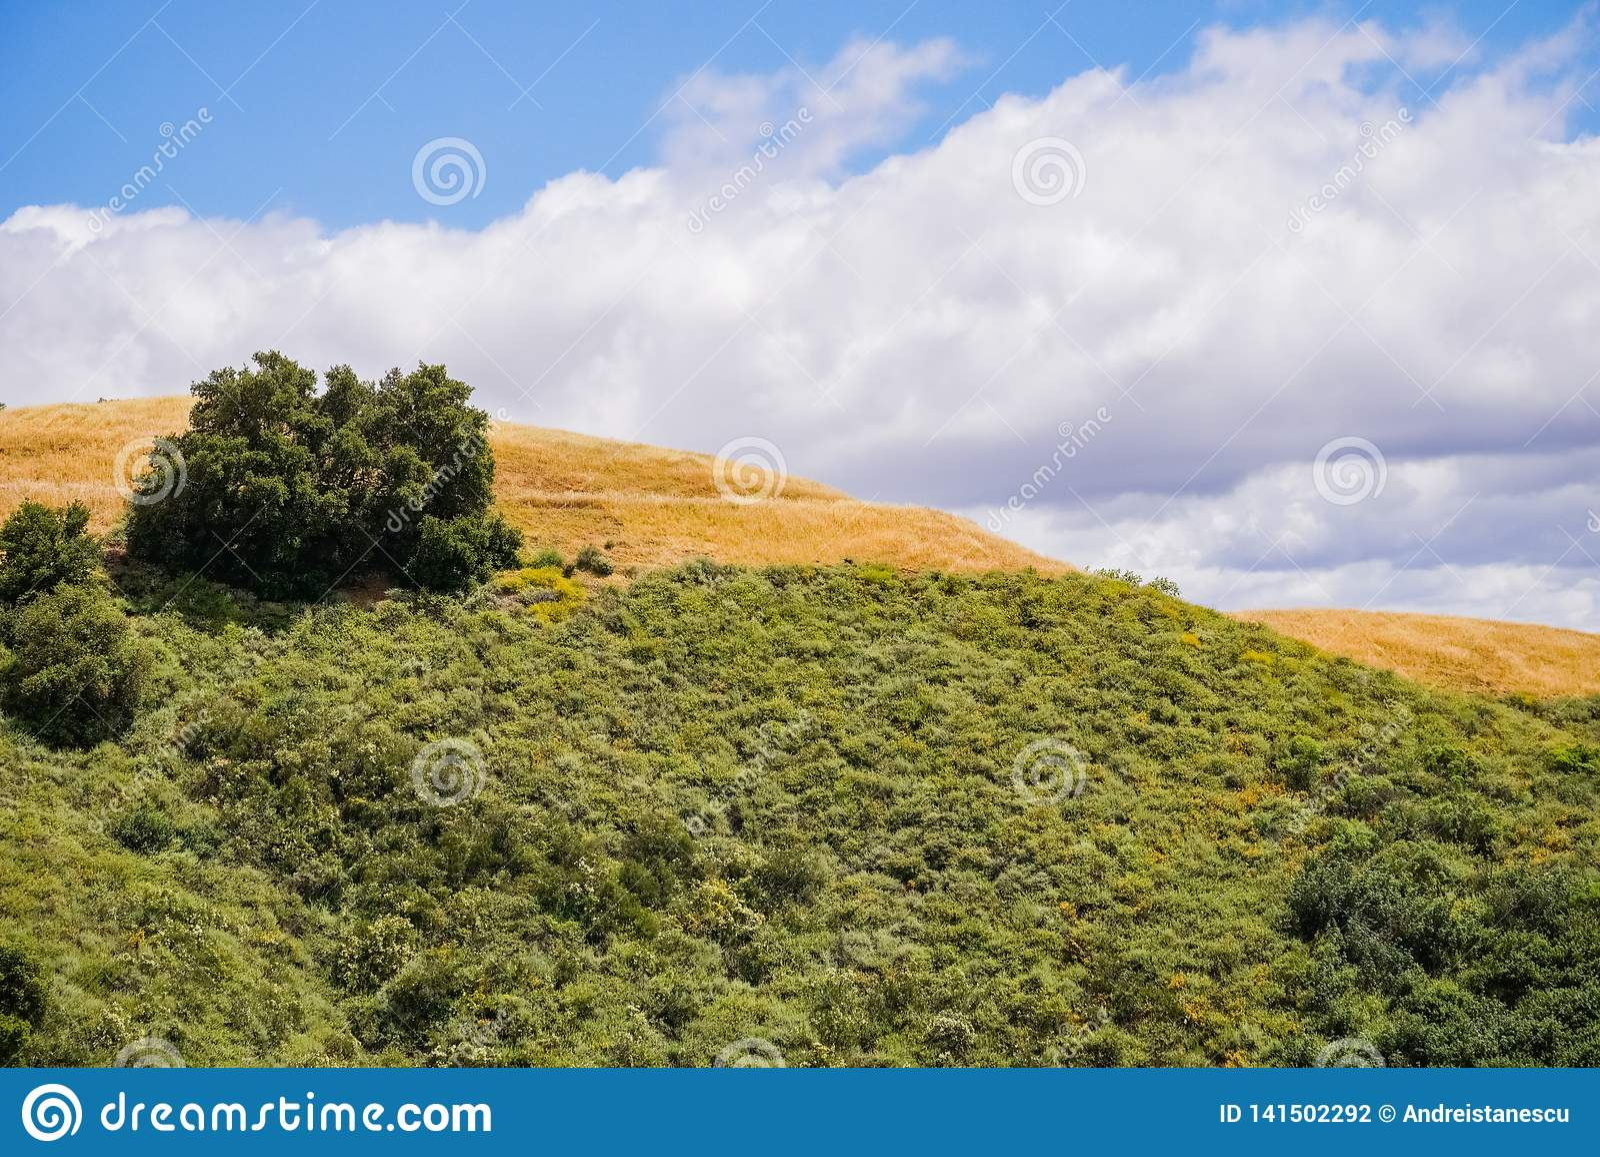 Hills in the Rancho Canada del Oro Open Space Preserve, south San Francisco bay area, San Jose, California